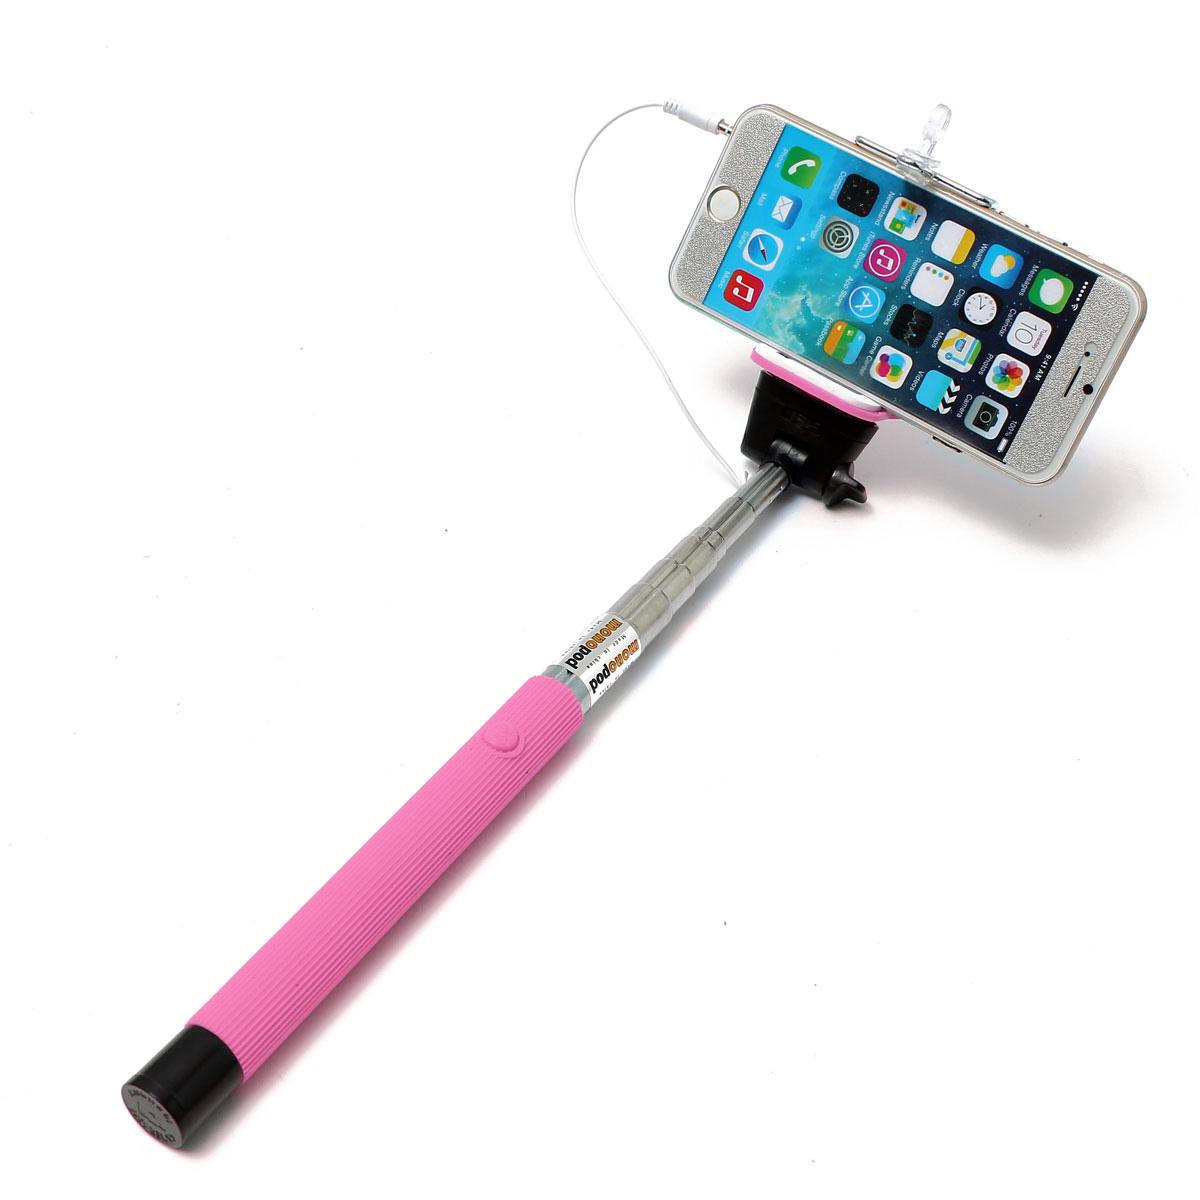 extendable wired remote shutter handheld selfie stick monopod for iphone ipod ebay. Black Bedroom Furniture Sets. Home Design Ideas